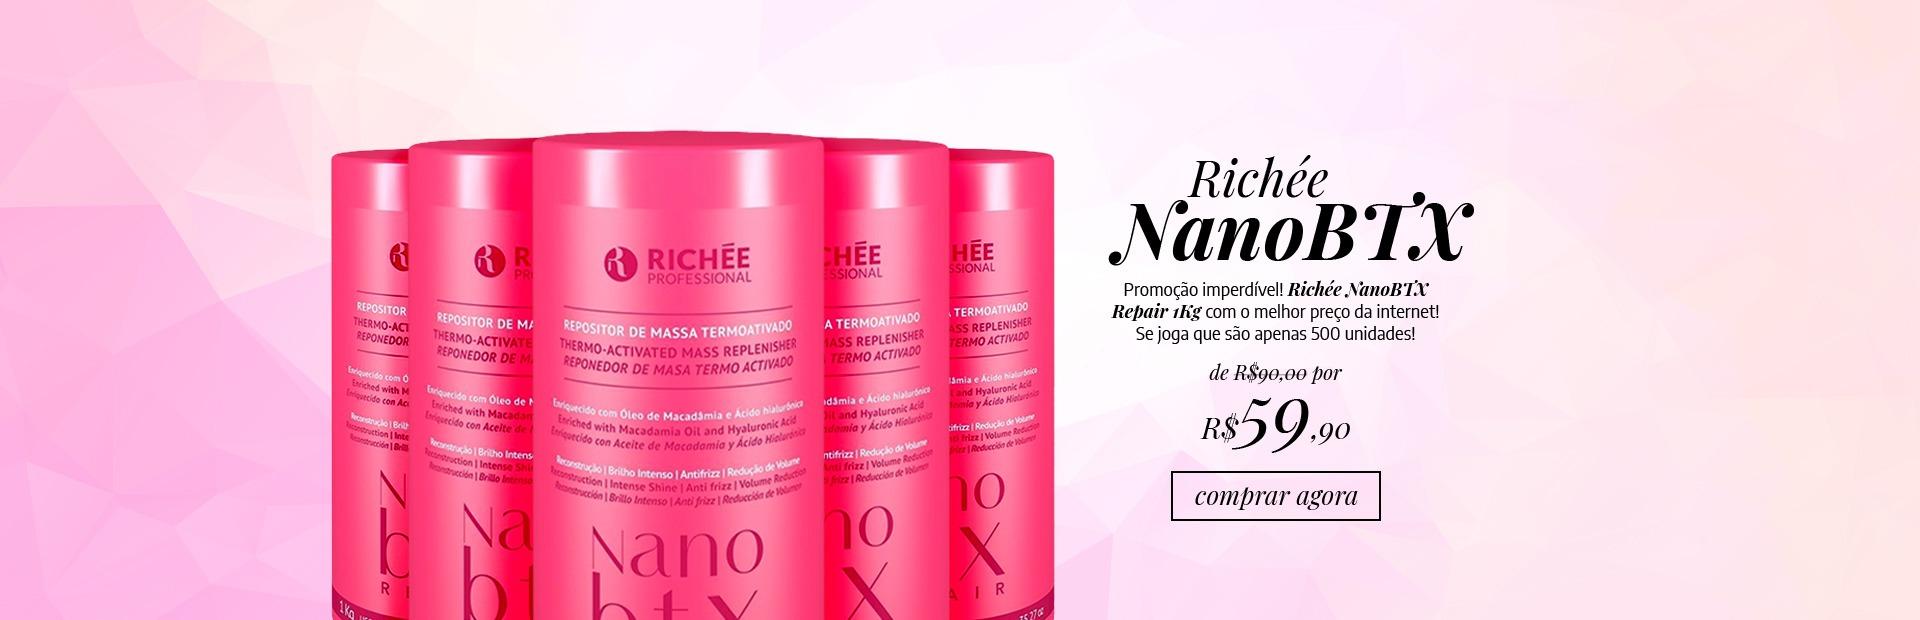 Richée NanoBTX